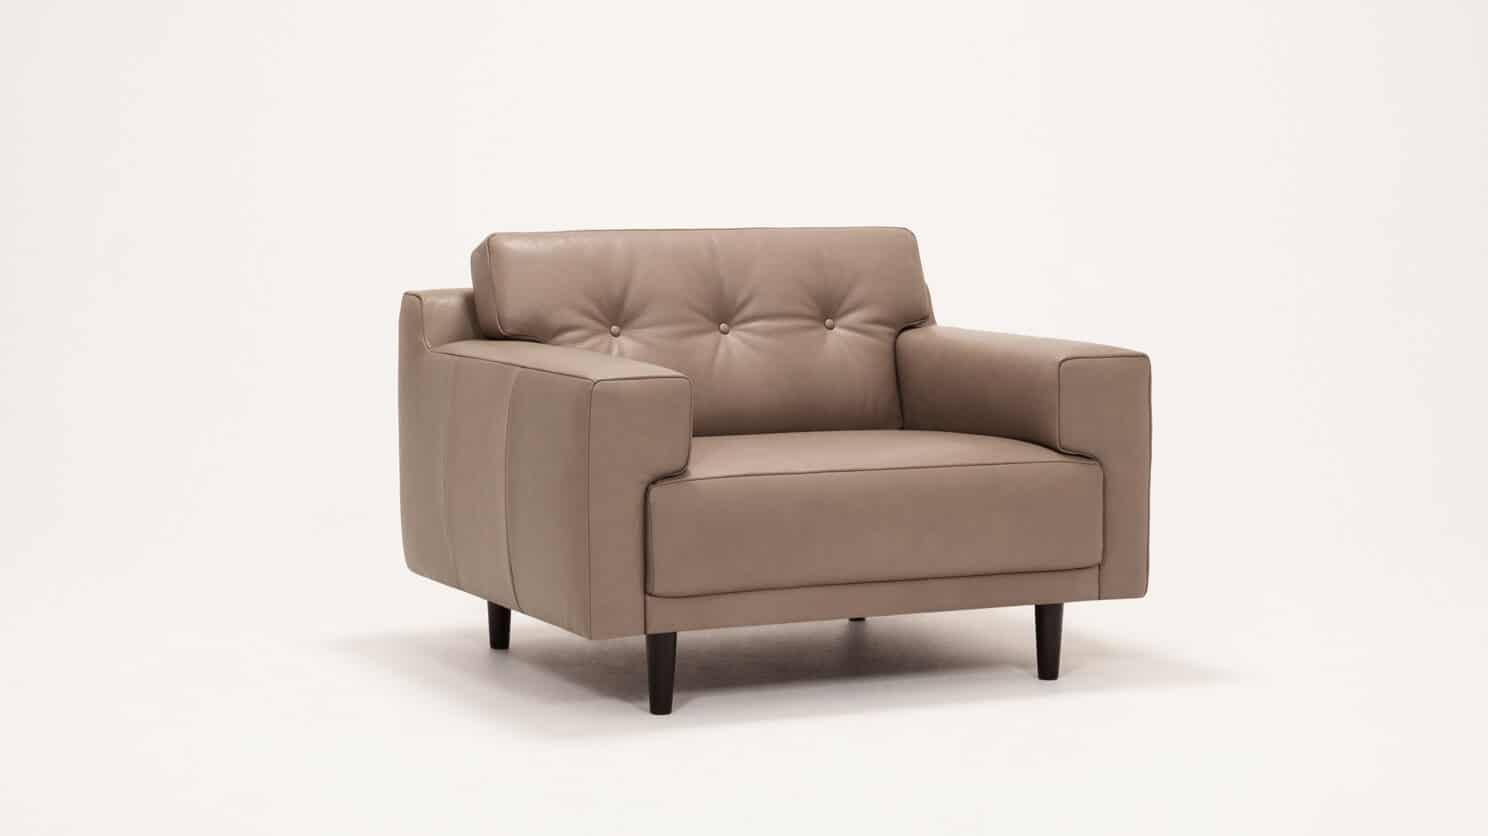 37133 02 2 chairs remi chair suave chrome button corner 01